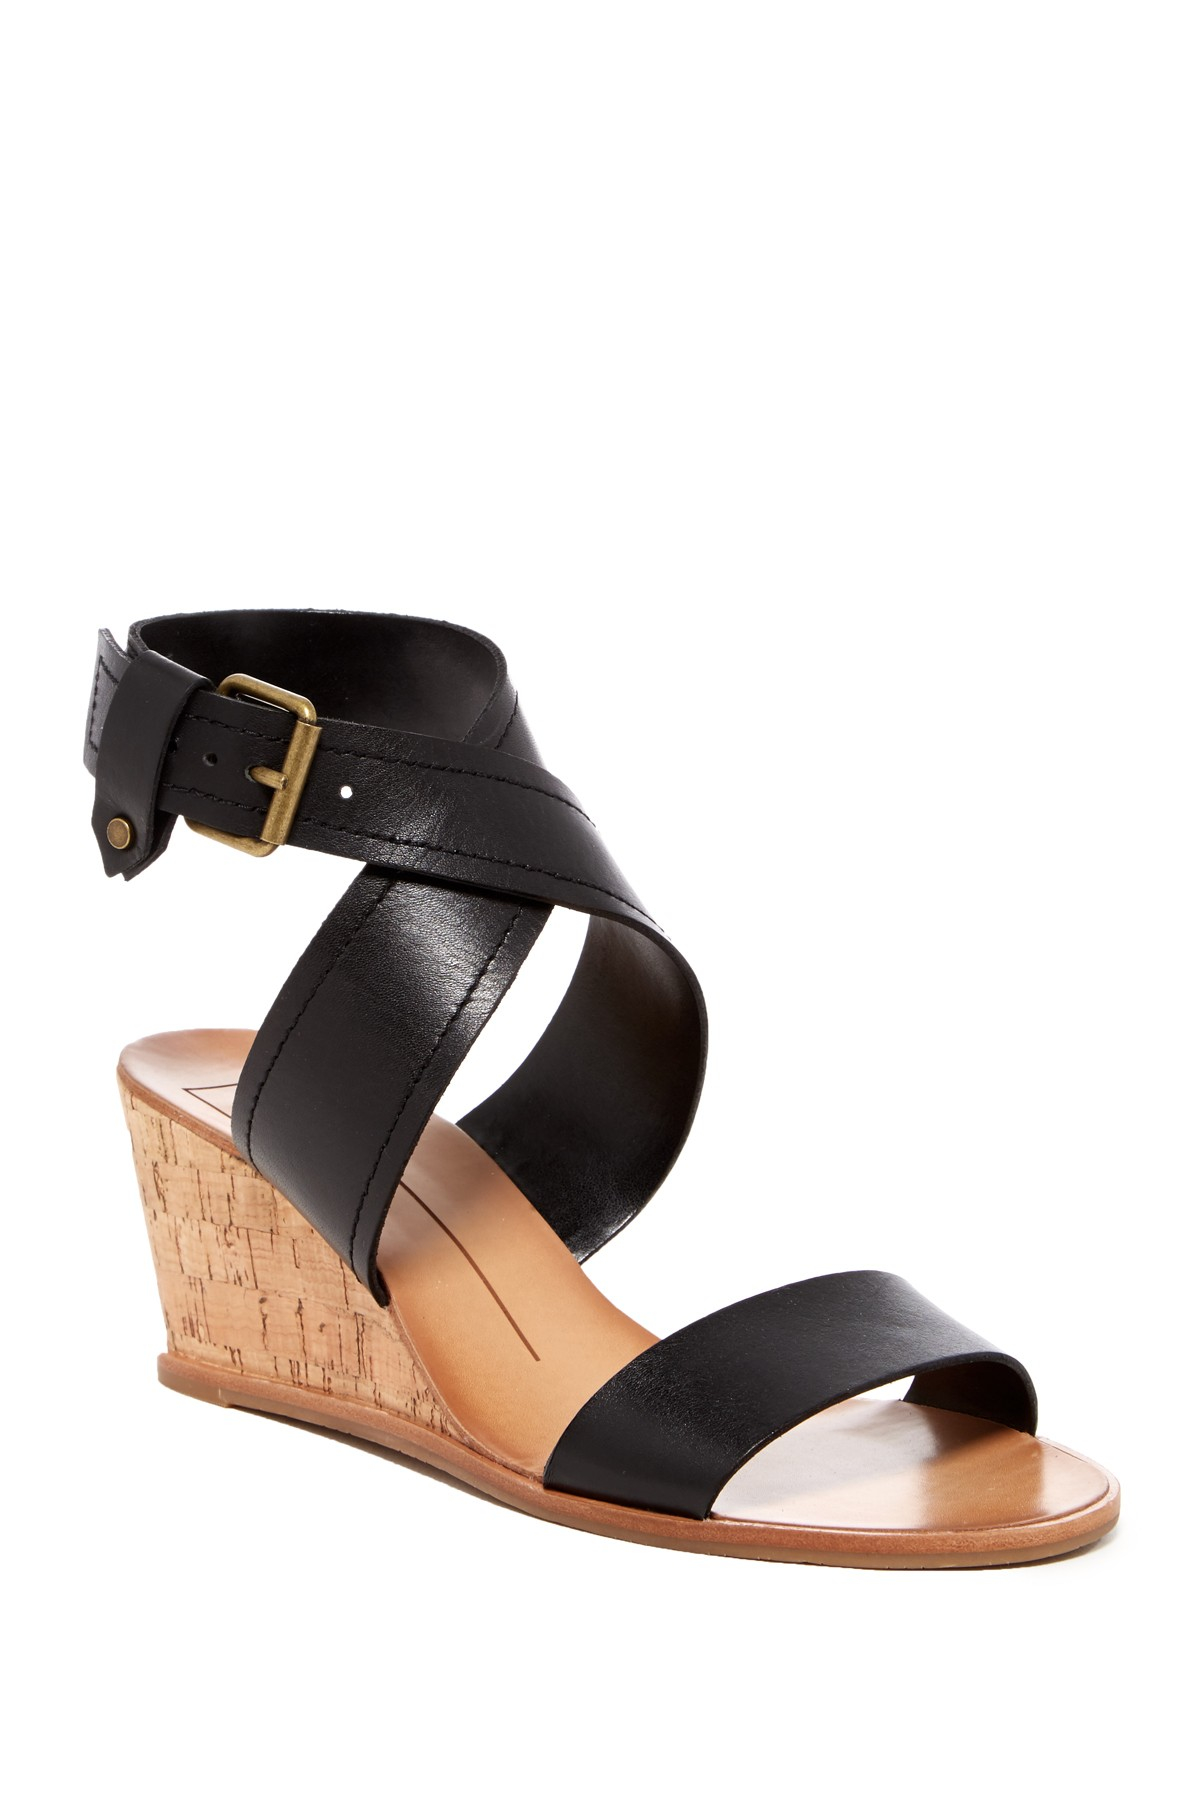 b36ec5a014f Lyst - Dolce Vita Lanston Wedge Sandal in Black